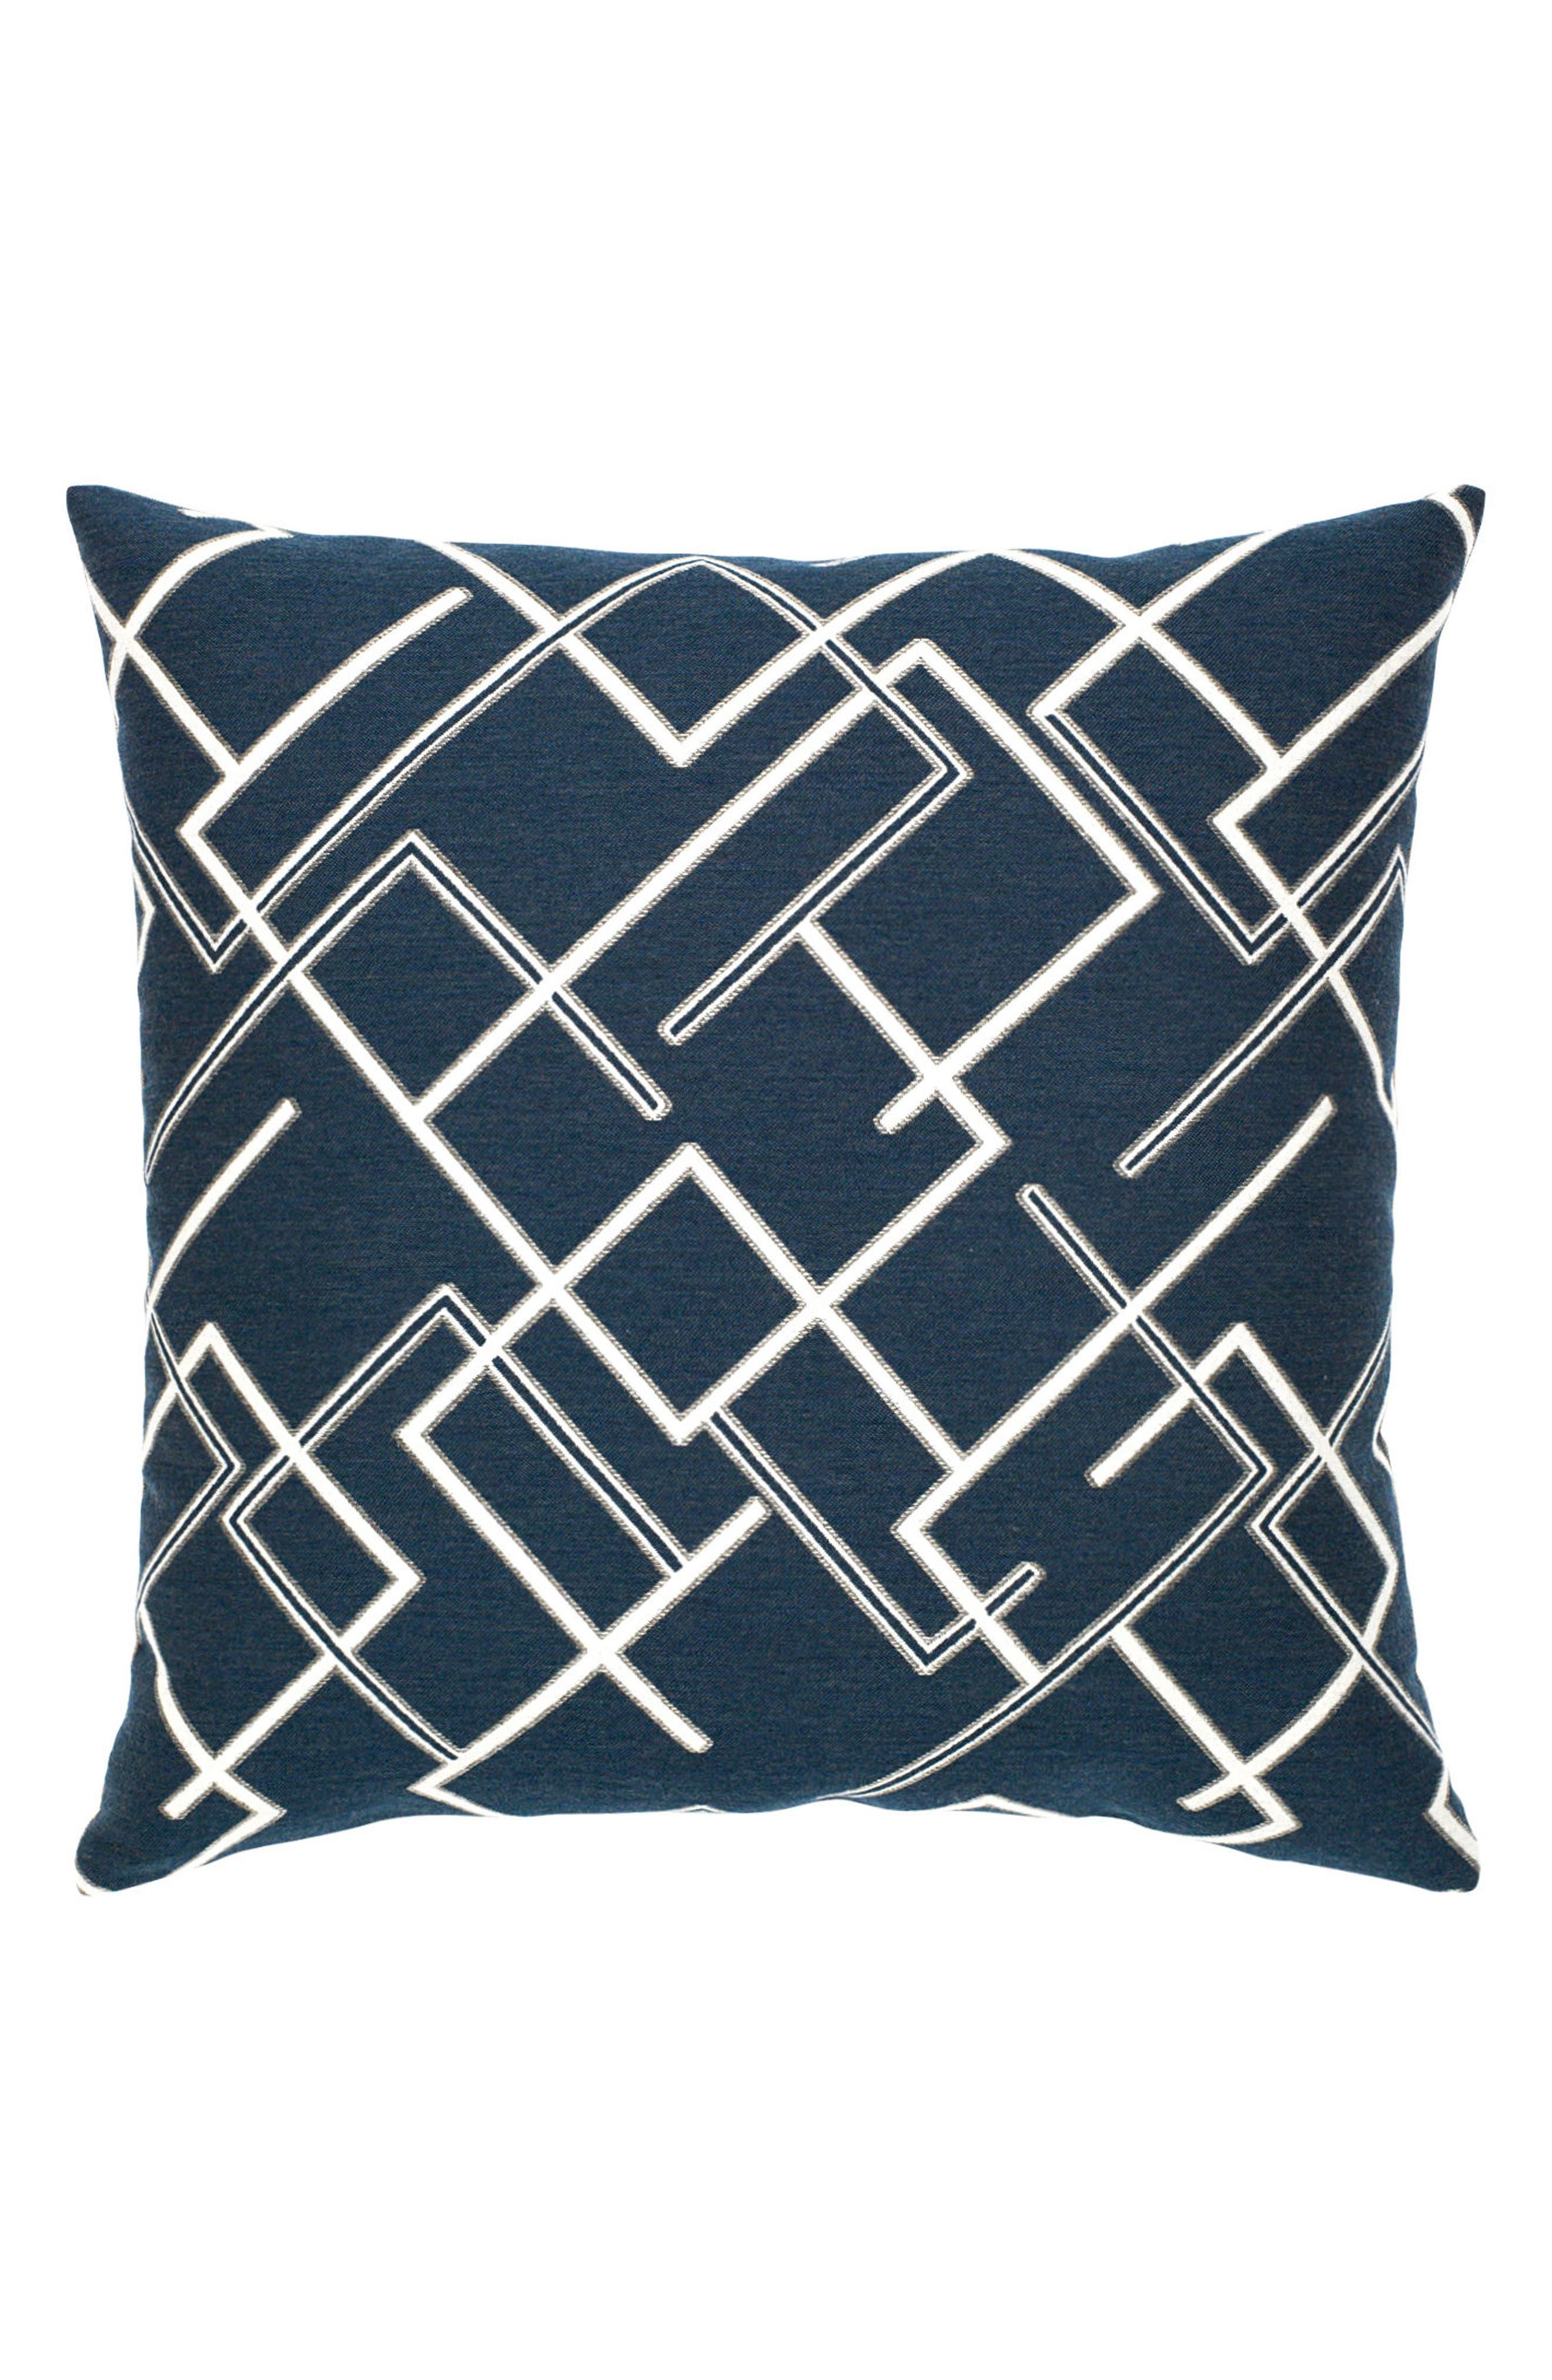 Divergence Indigo Indoor/Outdoor Accent Pillow,                             Main thumbnail 1, color,                             400